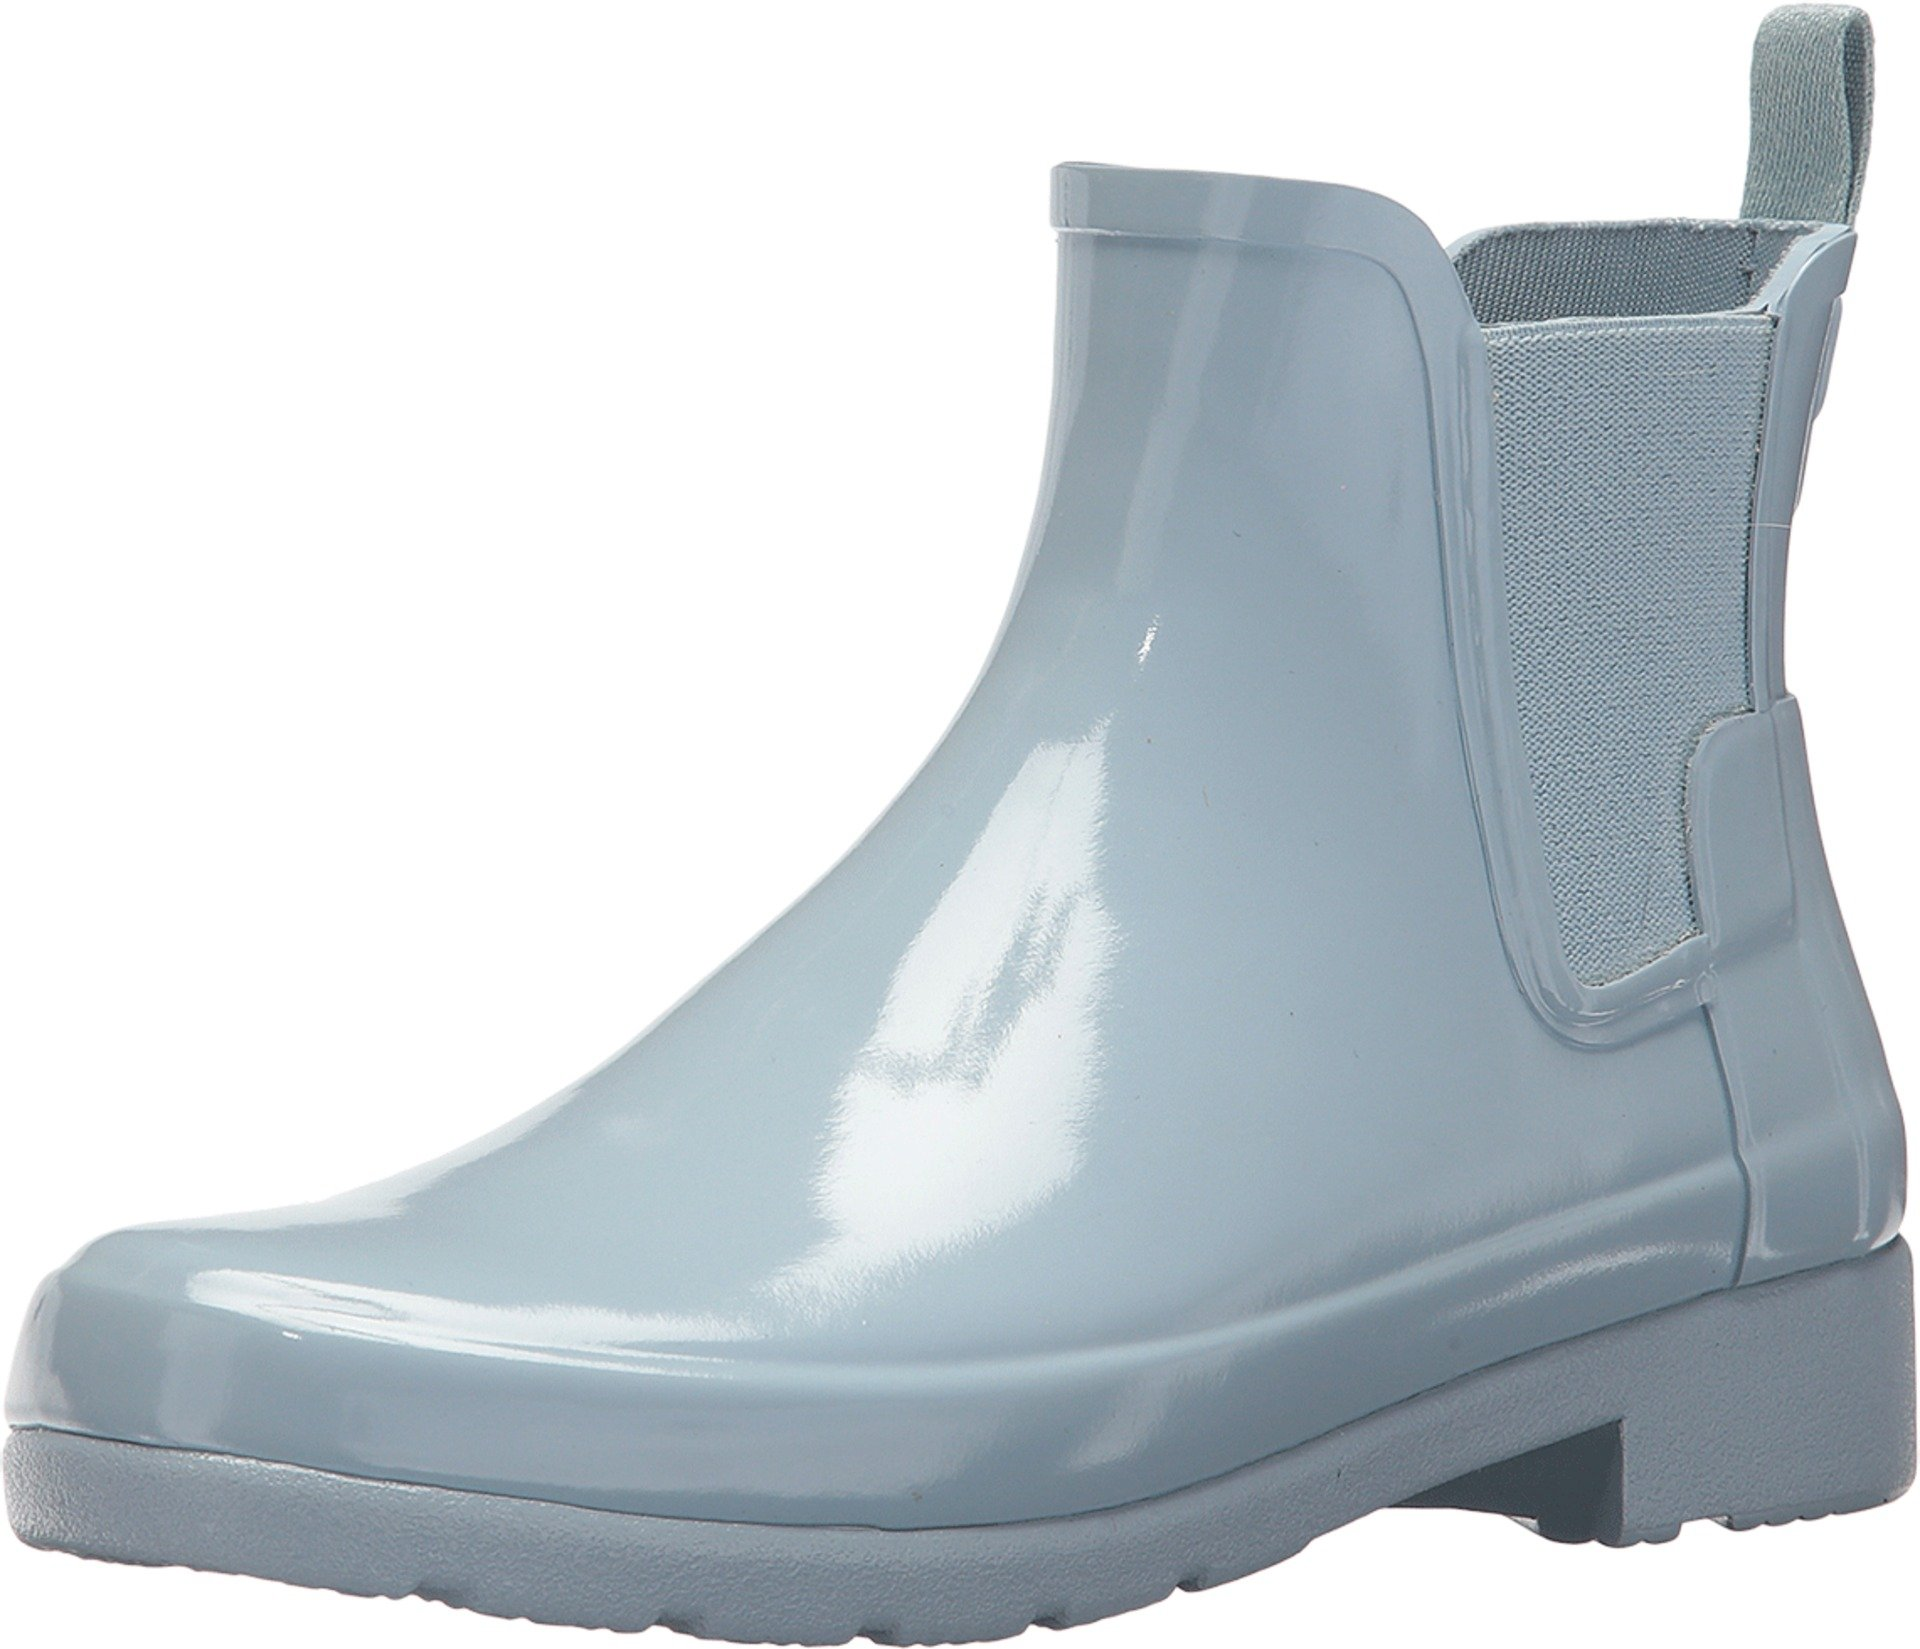 Hunter Women's Original Refined Chelsea Gloss Boots, Fountain Blue (7 M US)